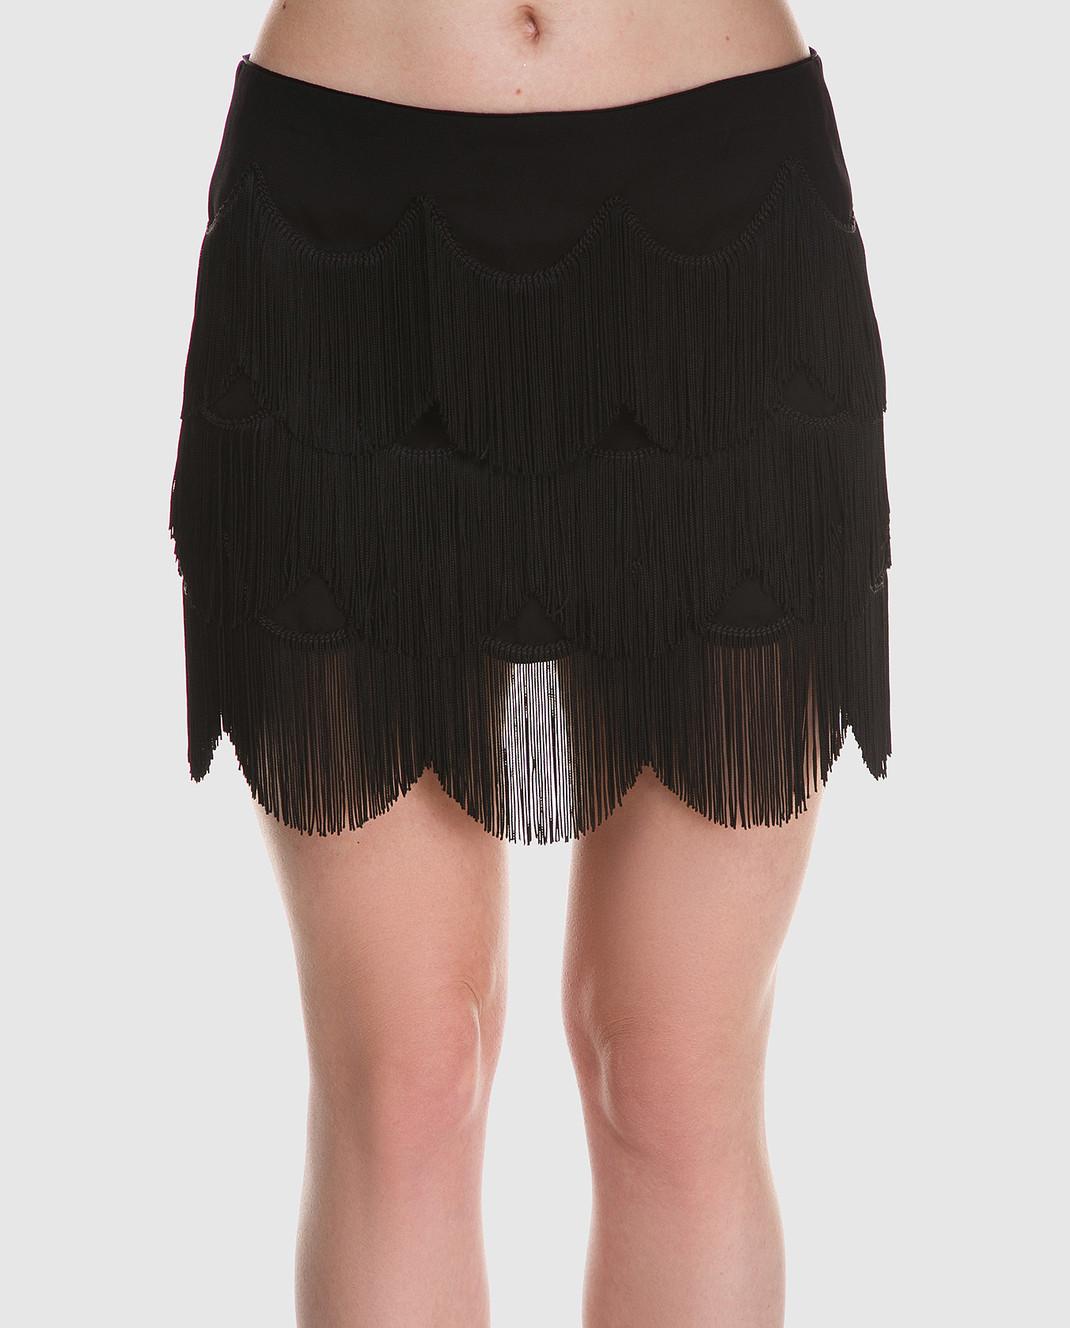 Marc Jacobs Черная юбка с бахромой M4007161 изображение 3